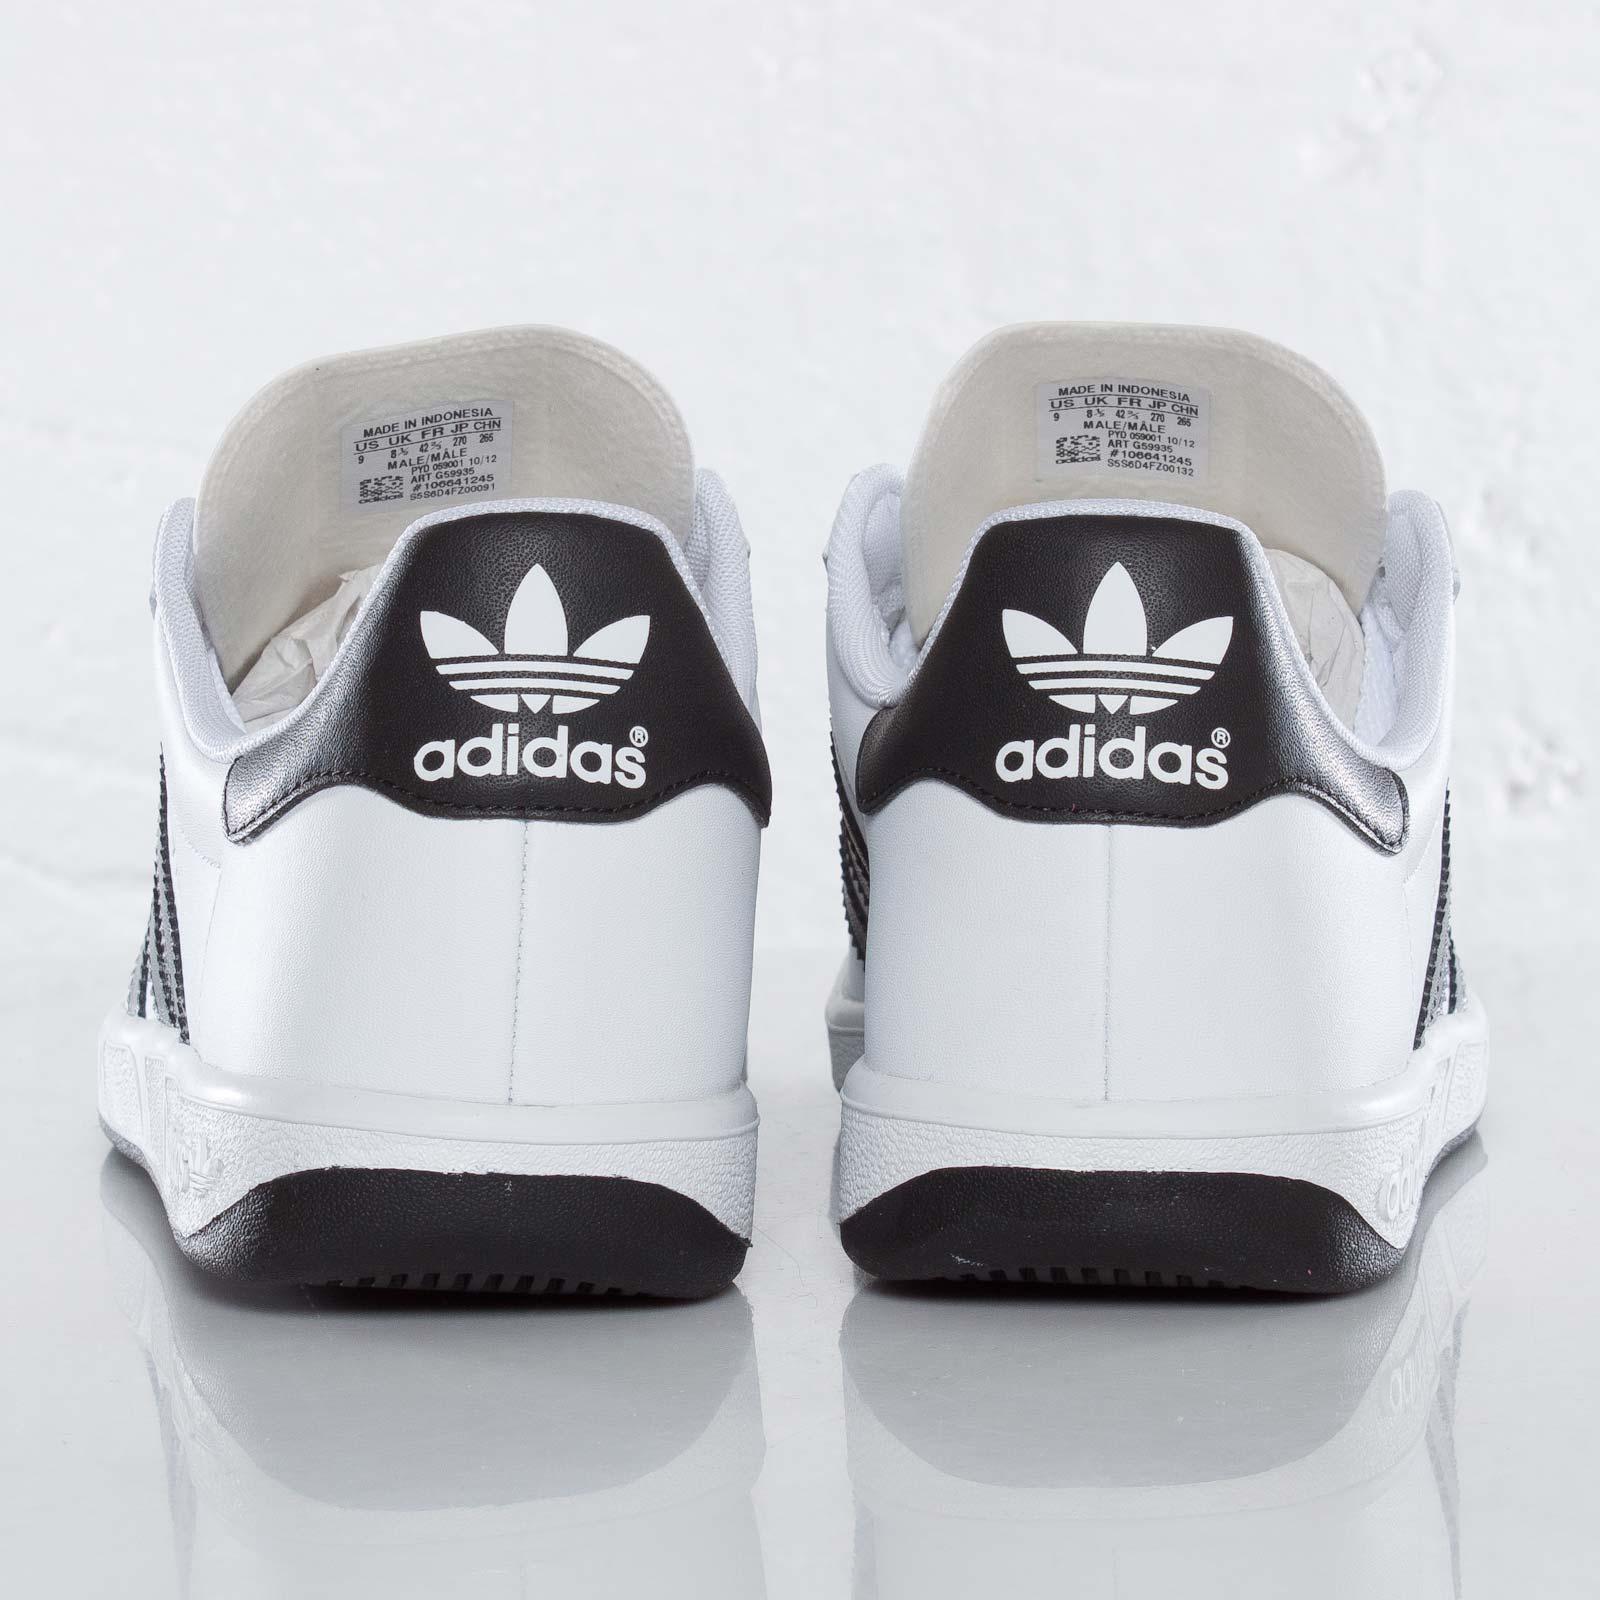 Grand PrixOriginals SaleRabatt Schuhe Bis Adidas hCxQstrdB